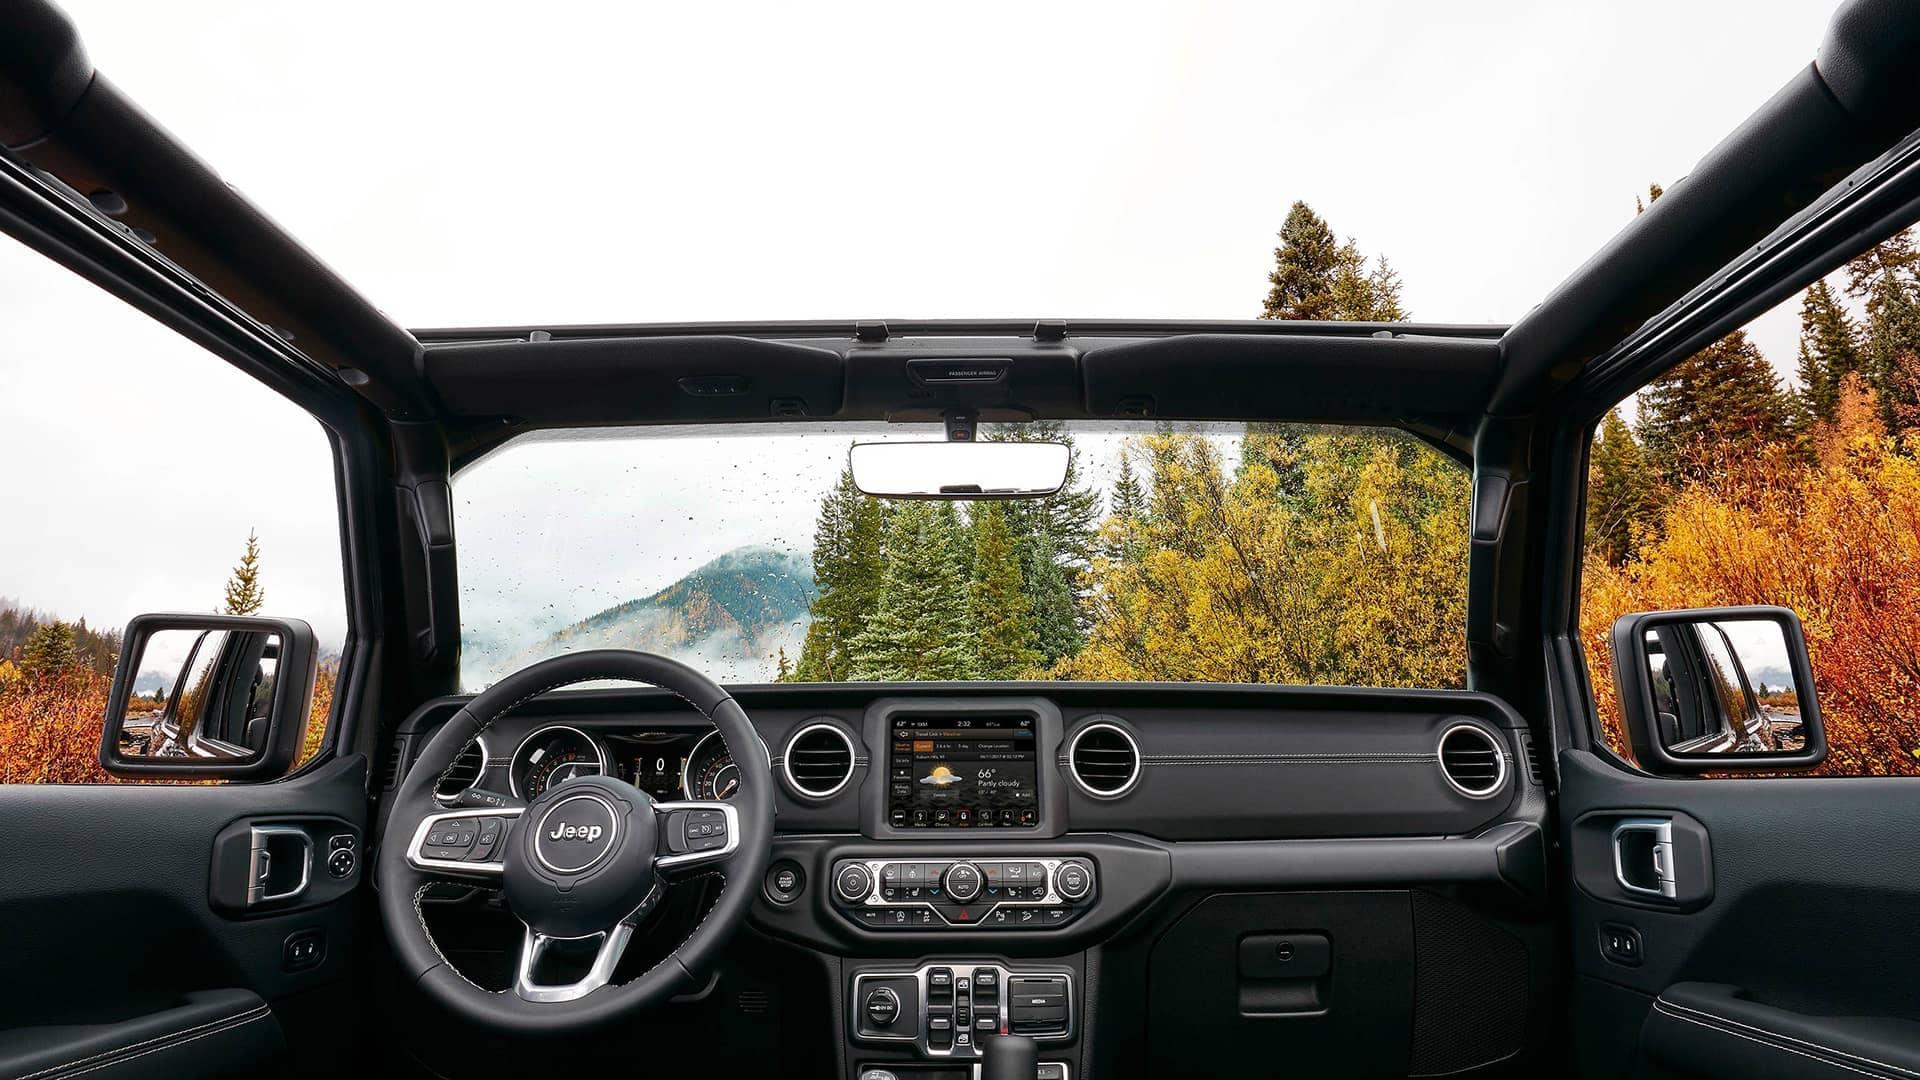 Jeep Wrangler JL Interior